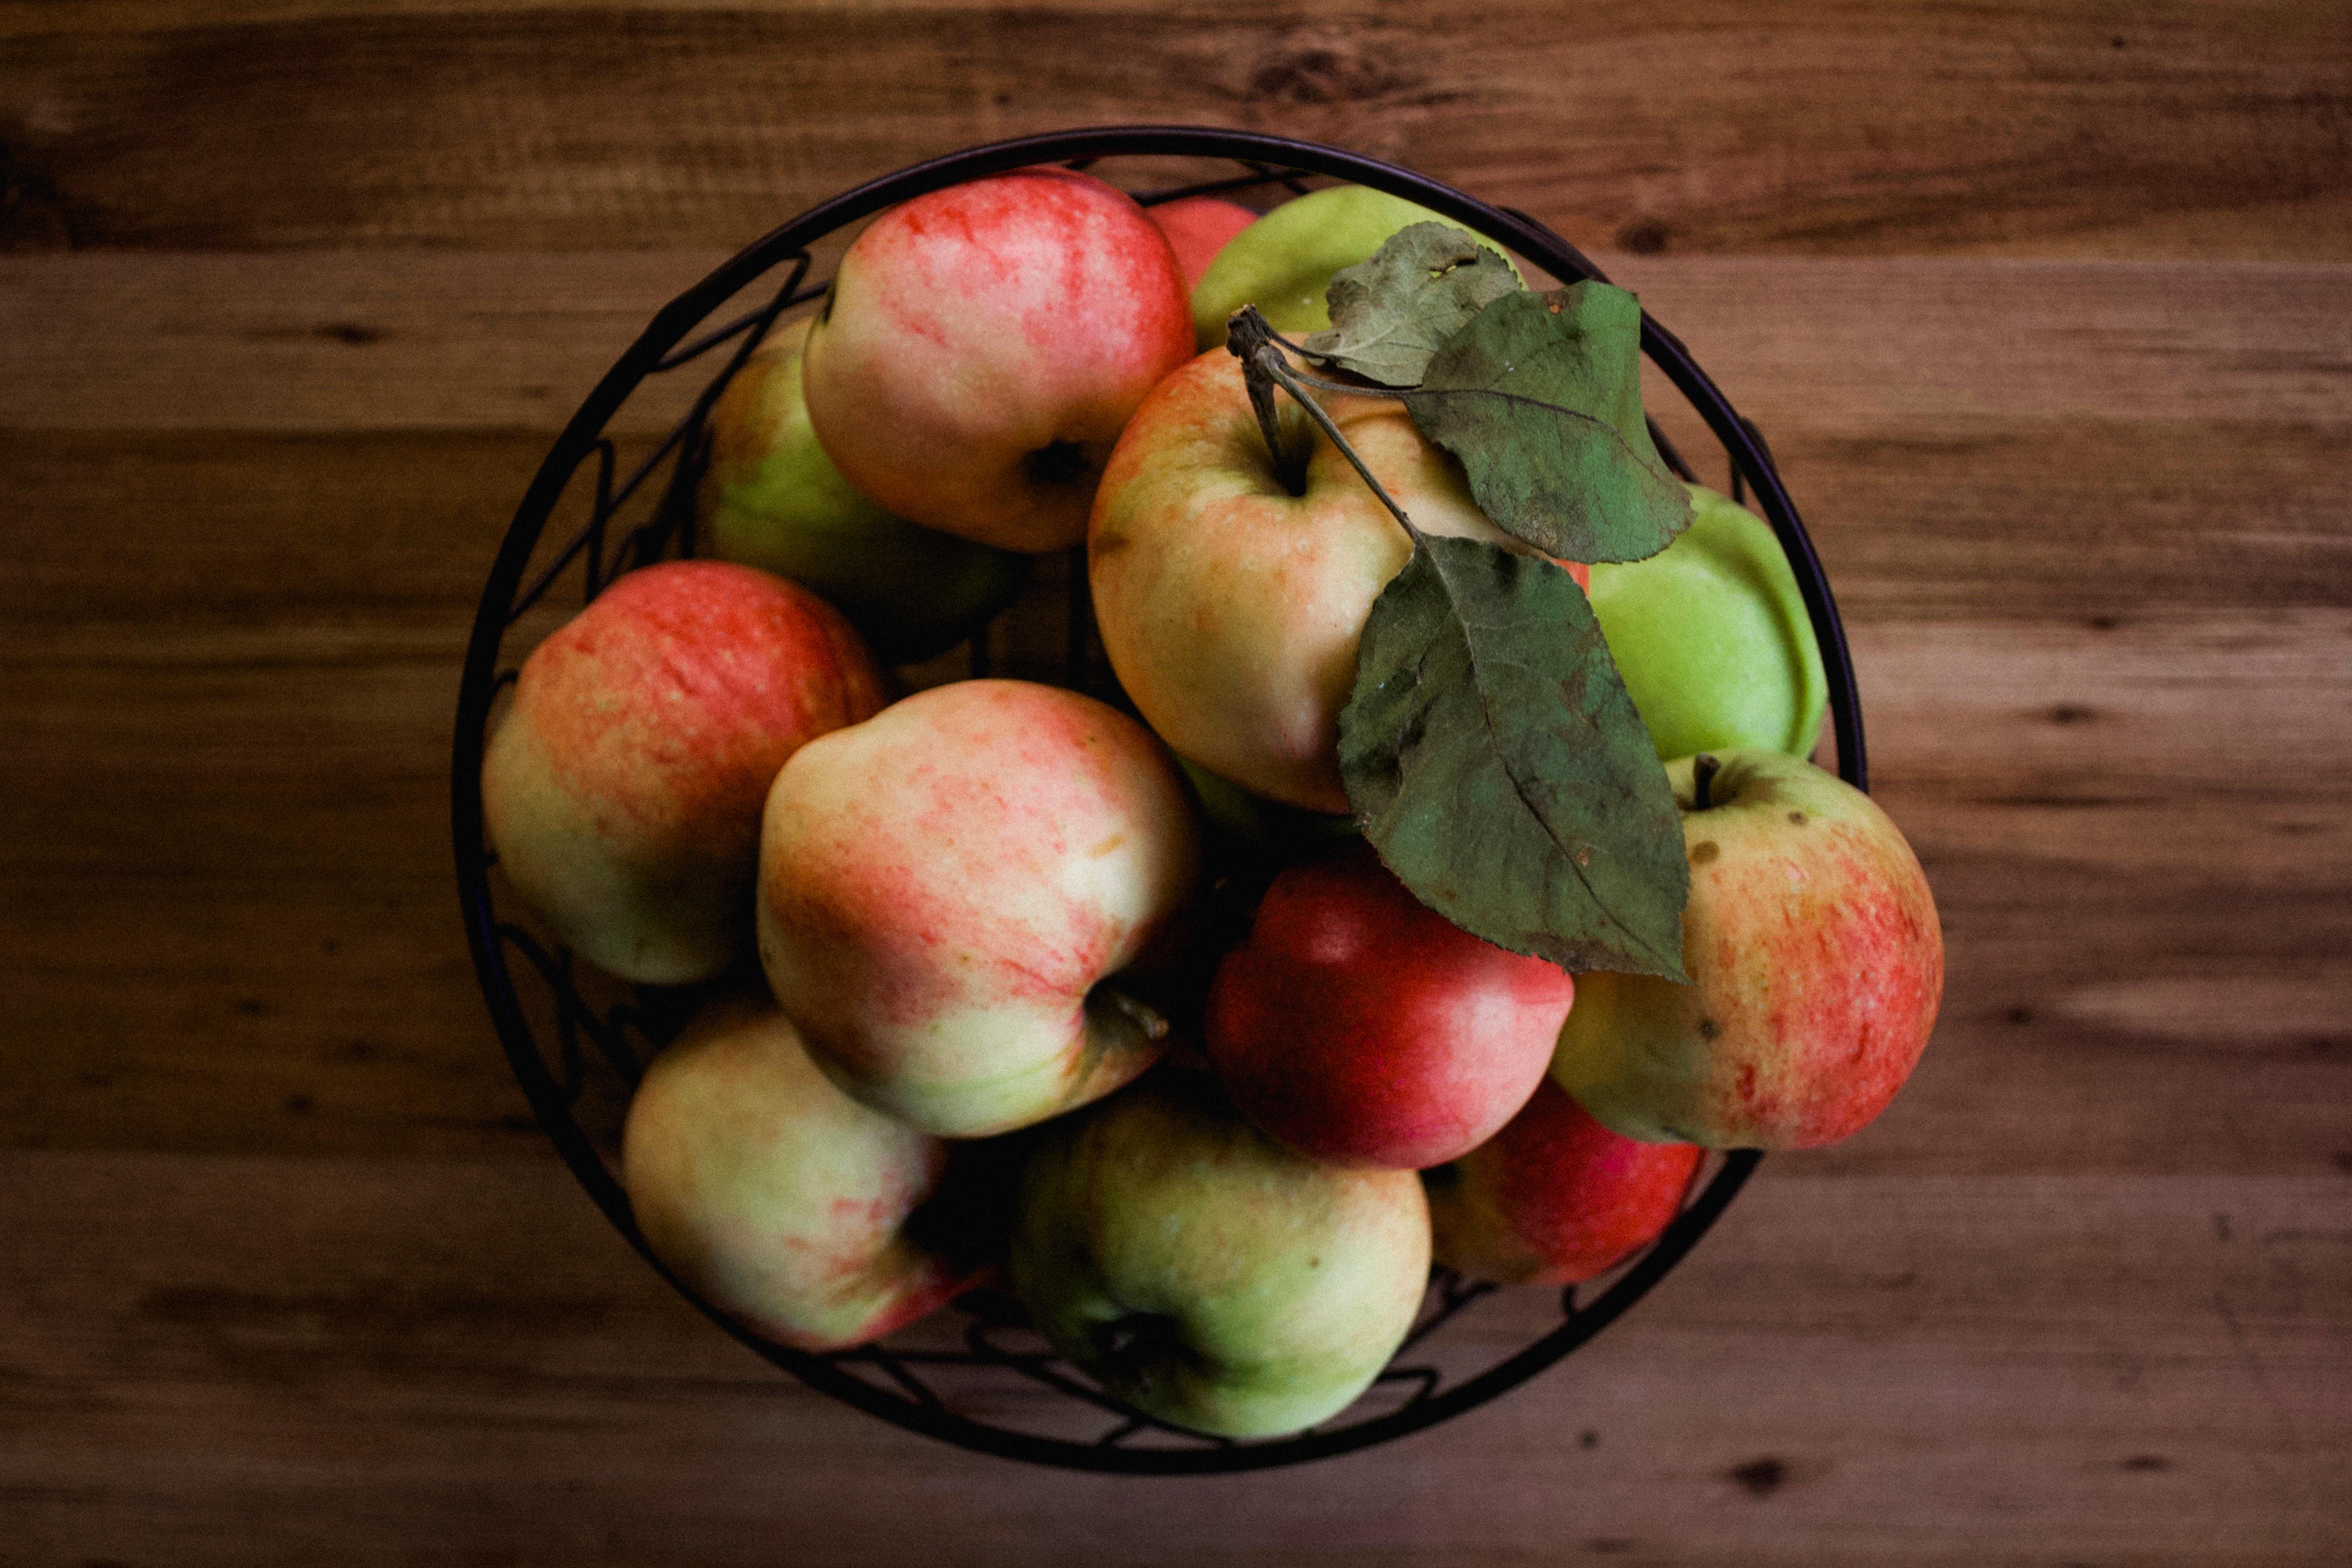 bowl of apples bought in bulk